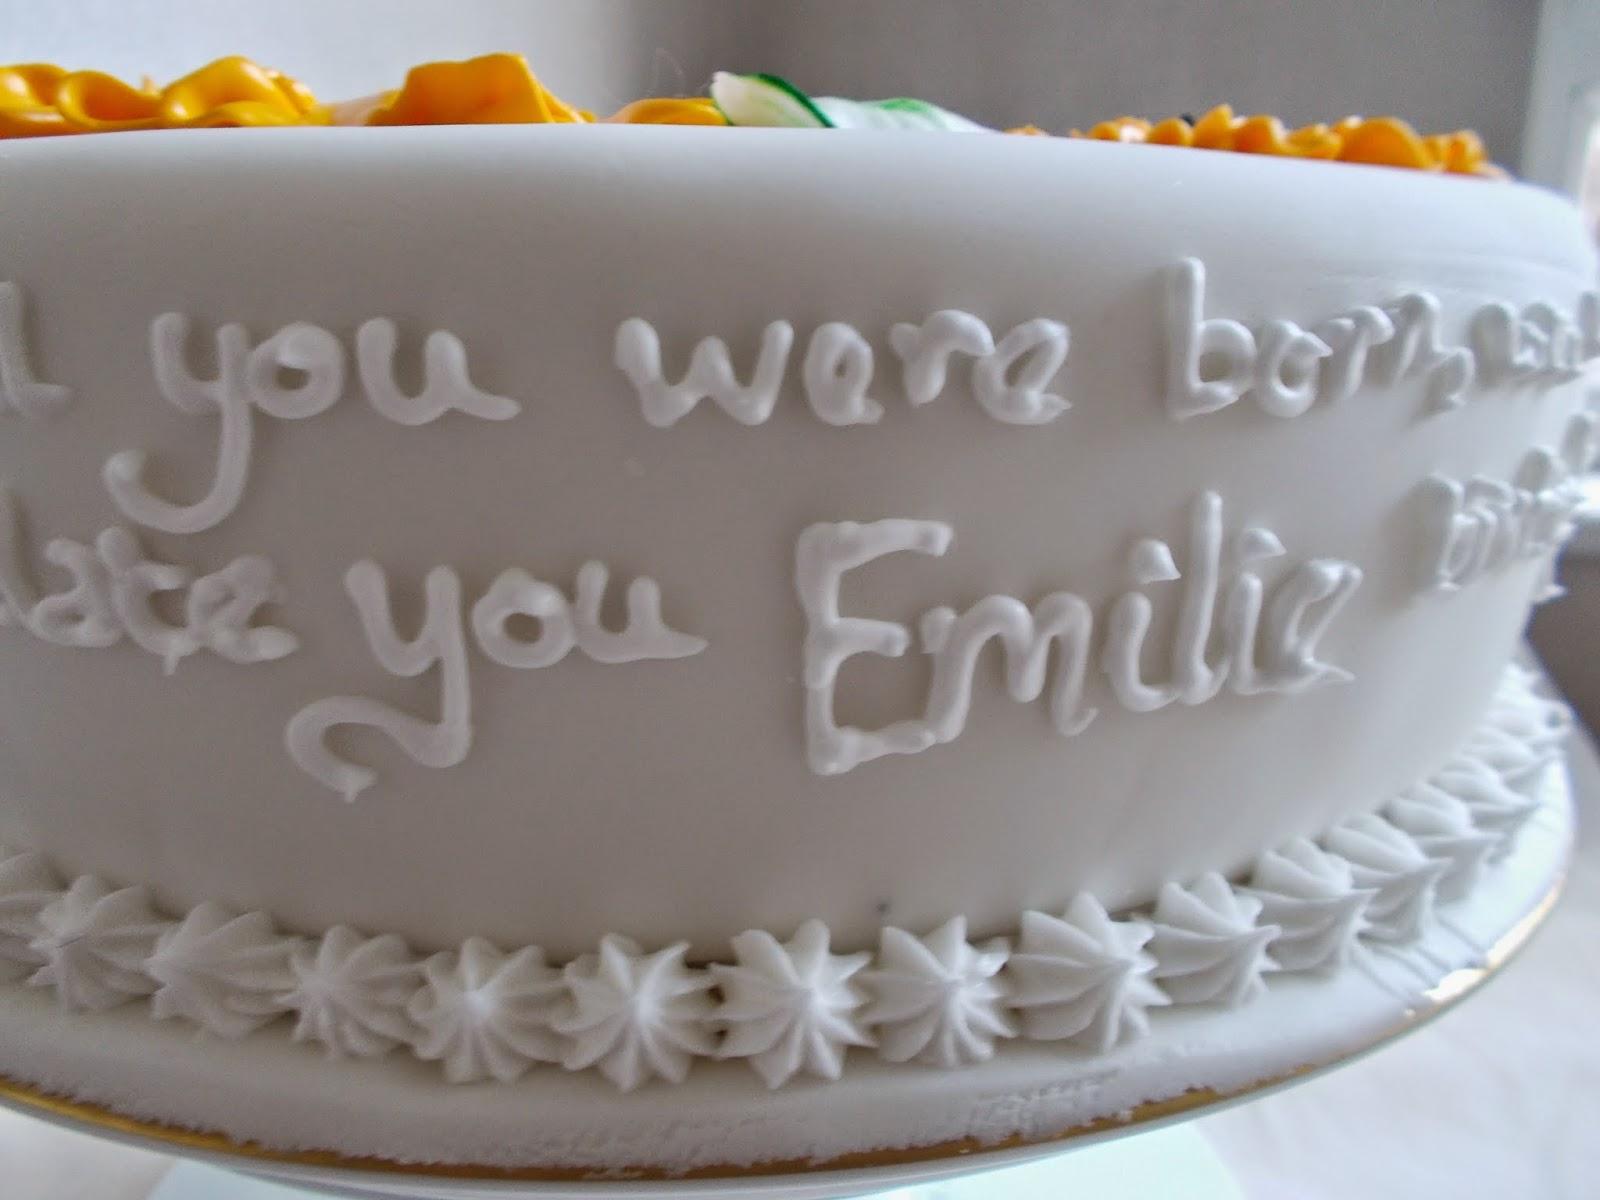 Birthday Cake With Name Zoya ~ Food and cakes with juyee: emilies birthday cake